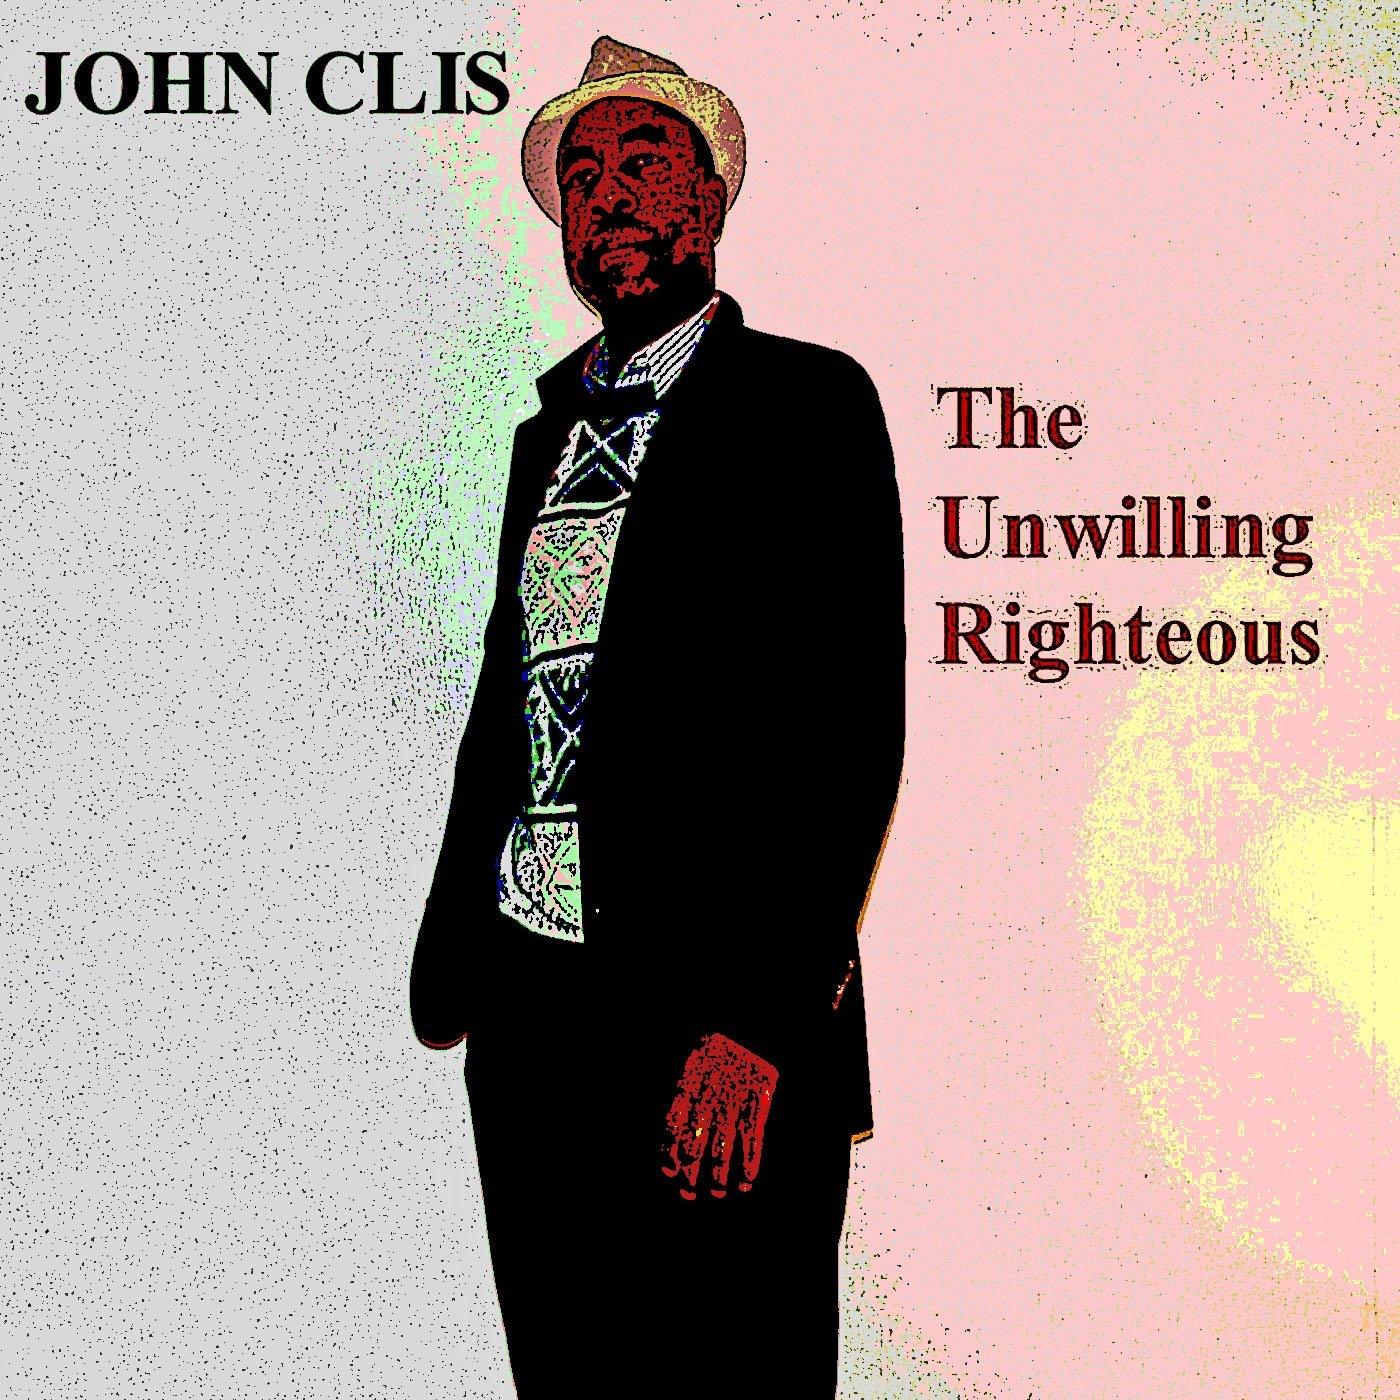 https://0201.nccdn.net/4_2/000/000/04b/787/John-Clis---The-Unwilling-Righteous---Photo-1400x1400.jpg